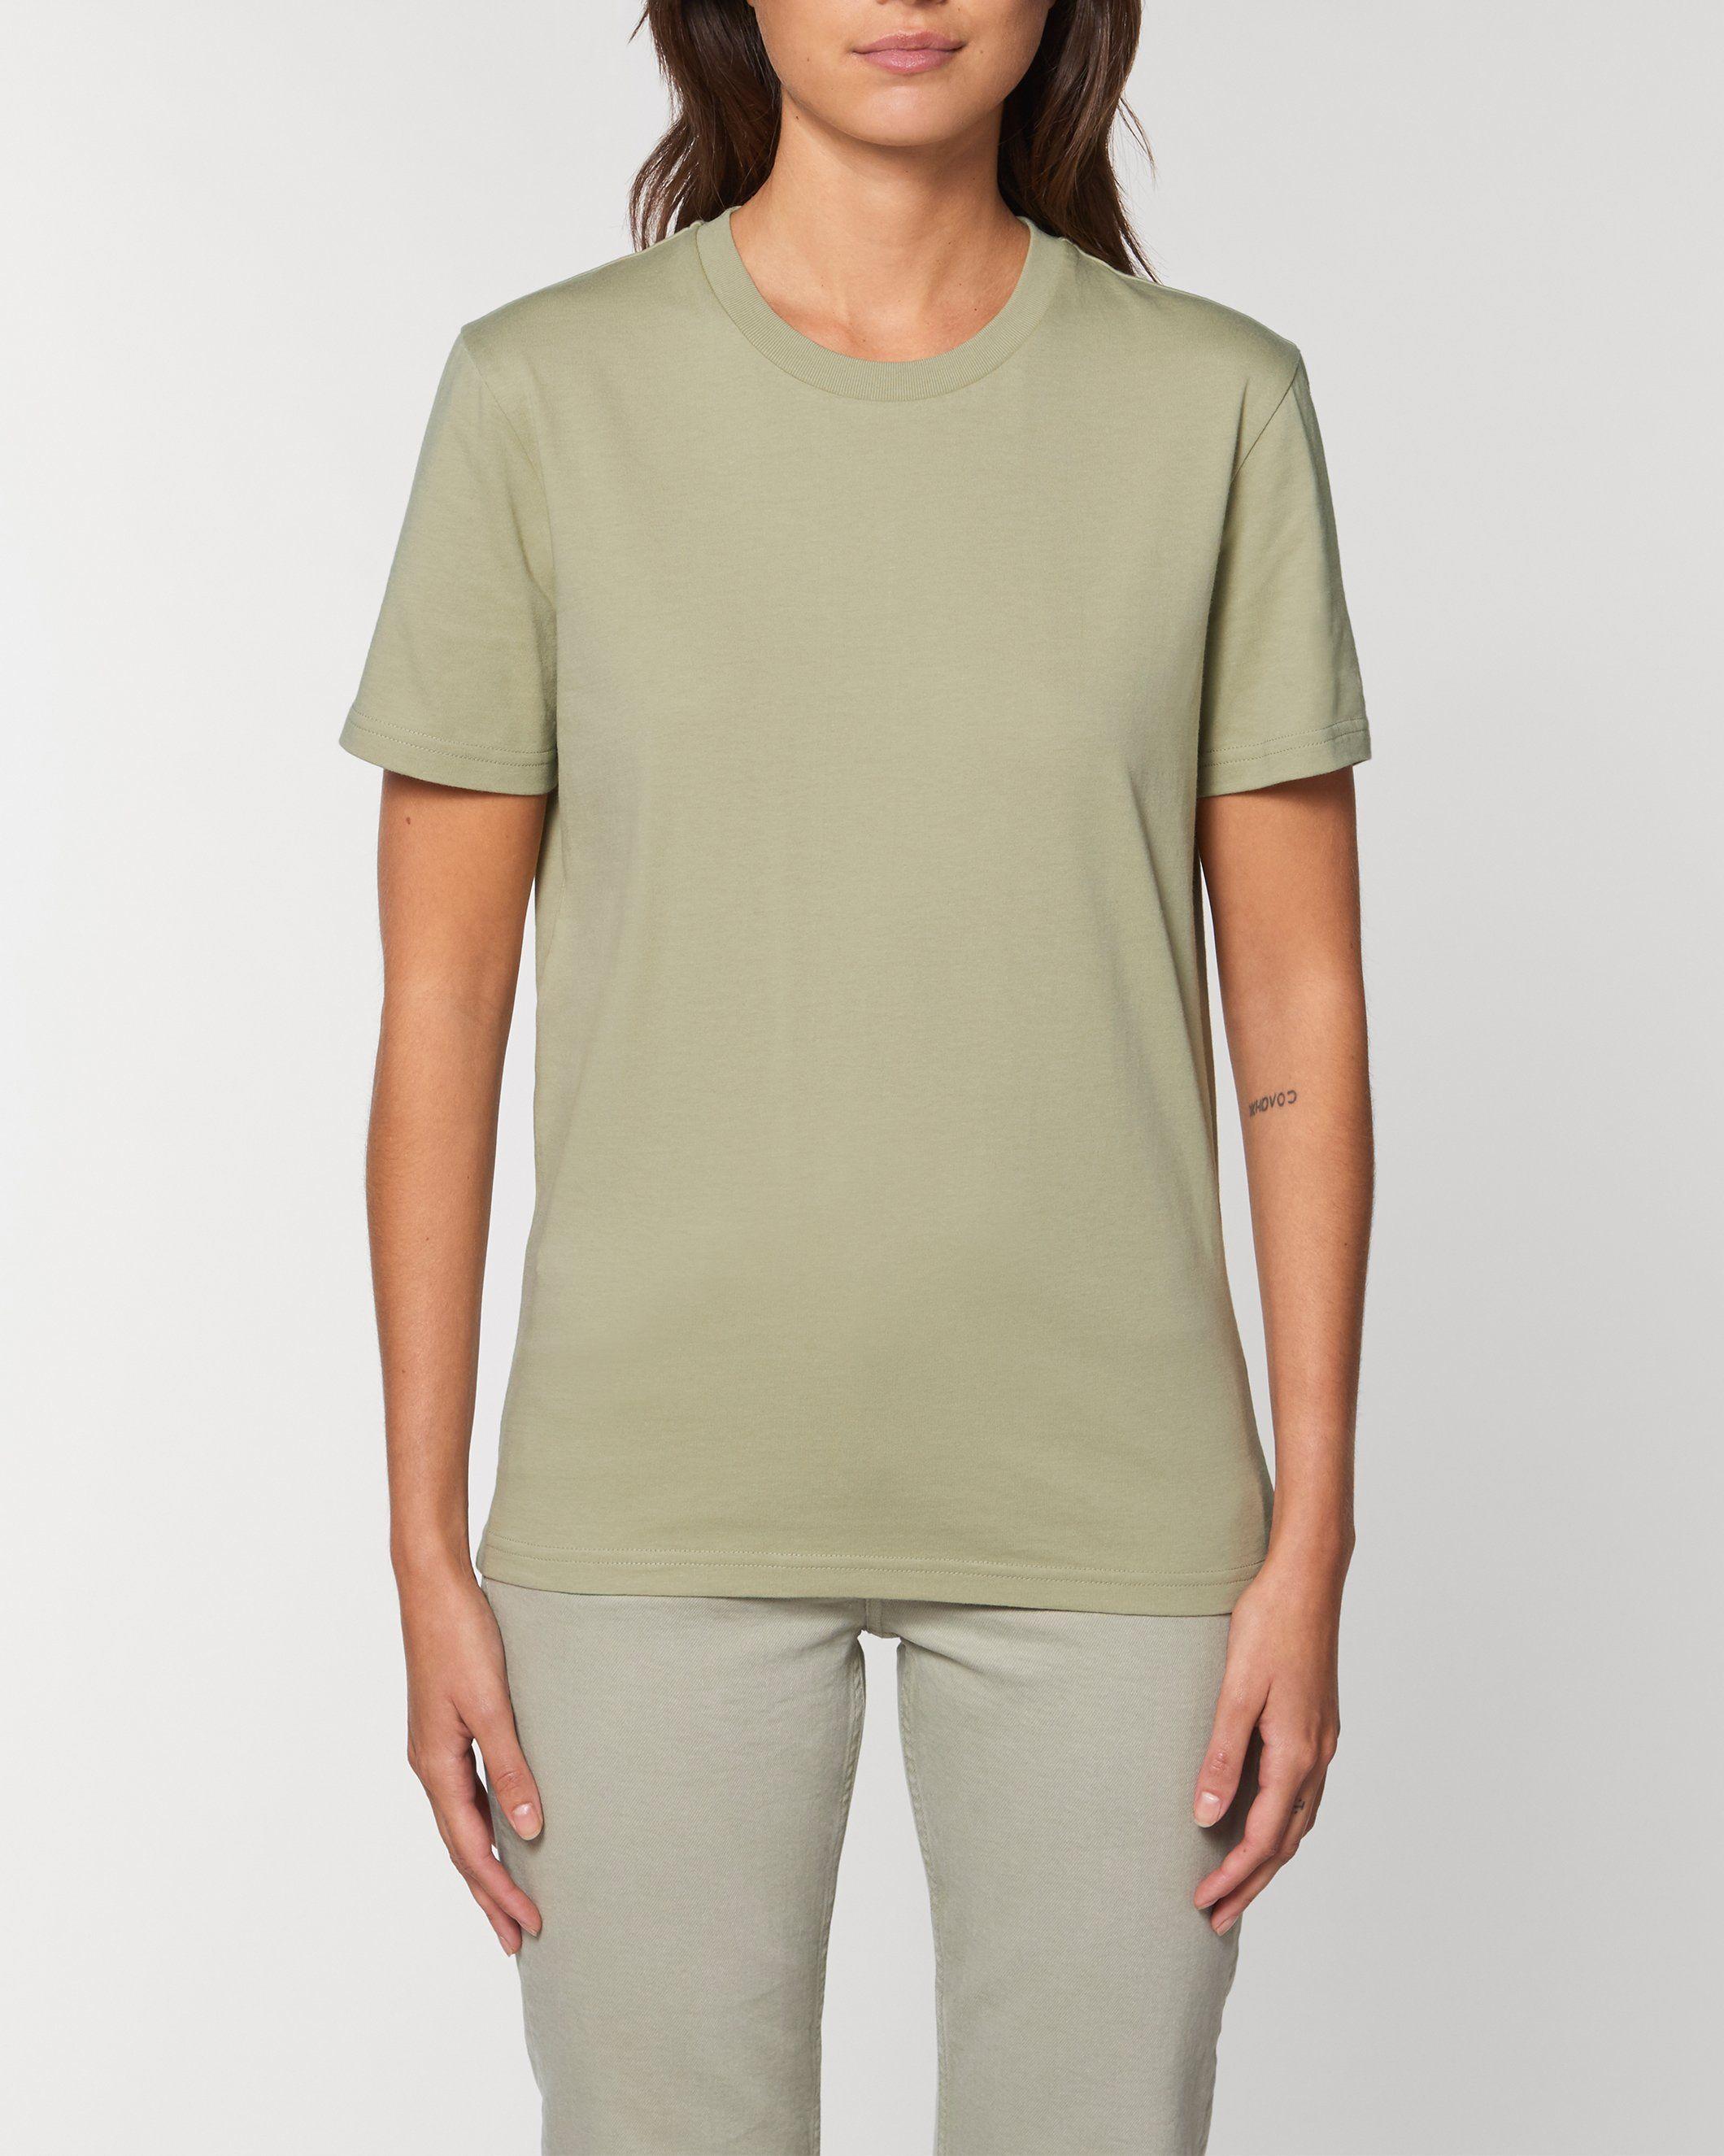 Nauli Unisex Regular Fit T-Shirt in Green